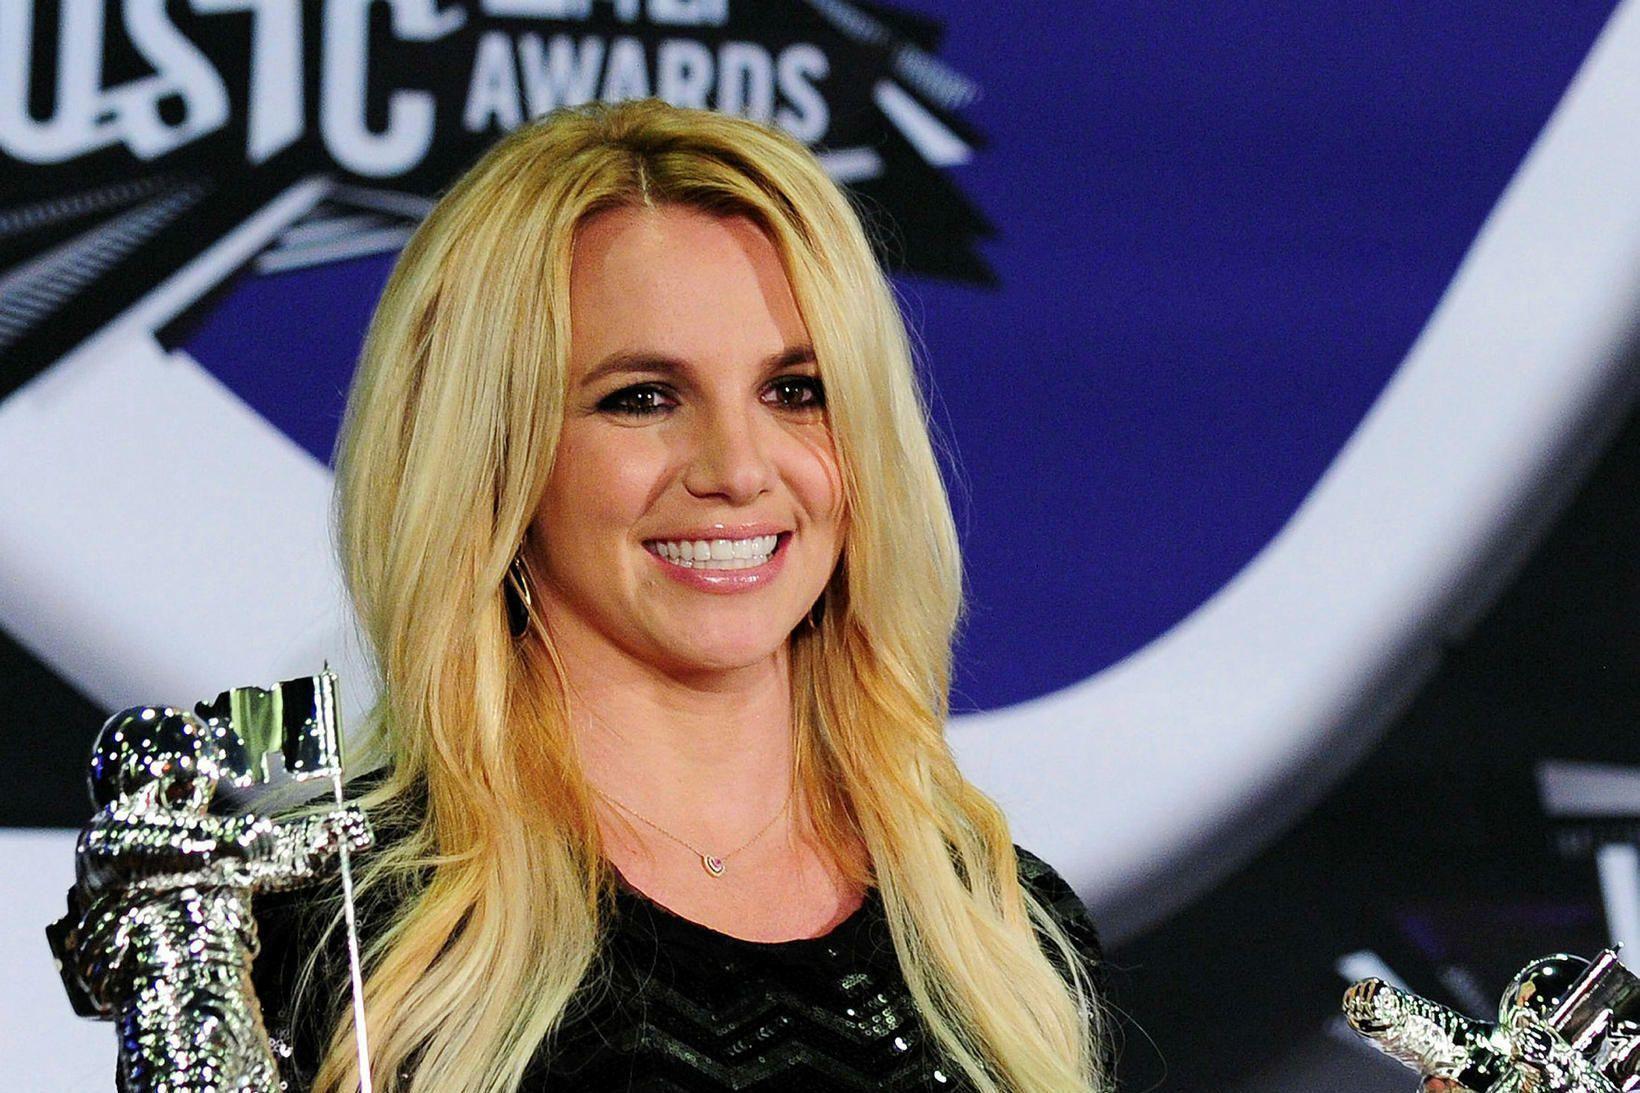 Britney Spears lofsamaði syni sína tvo, Sean Preston og Jayden …